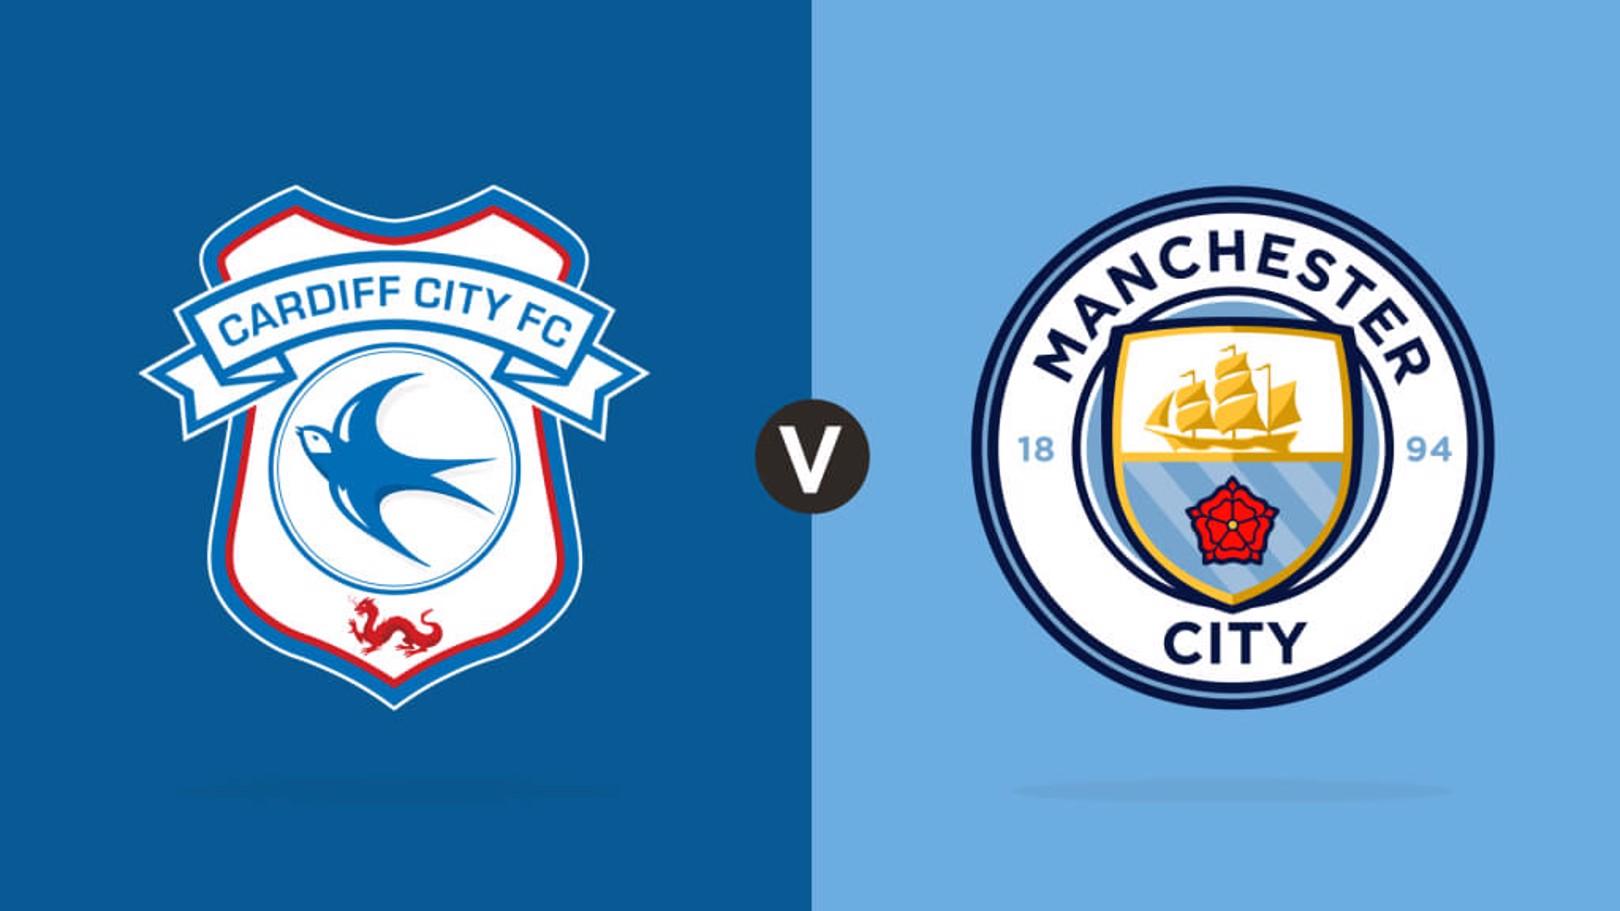 Cardiff v City